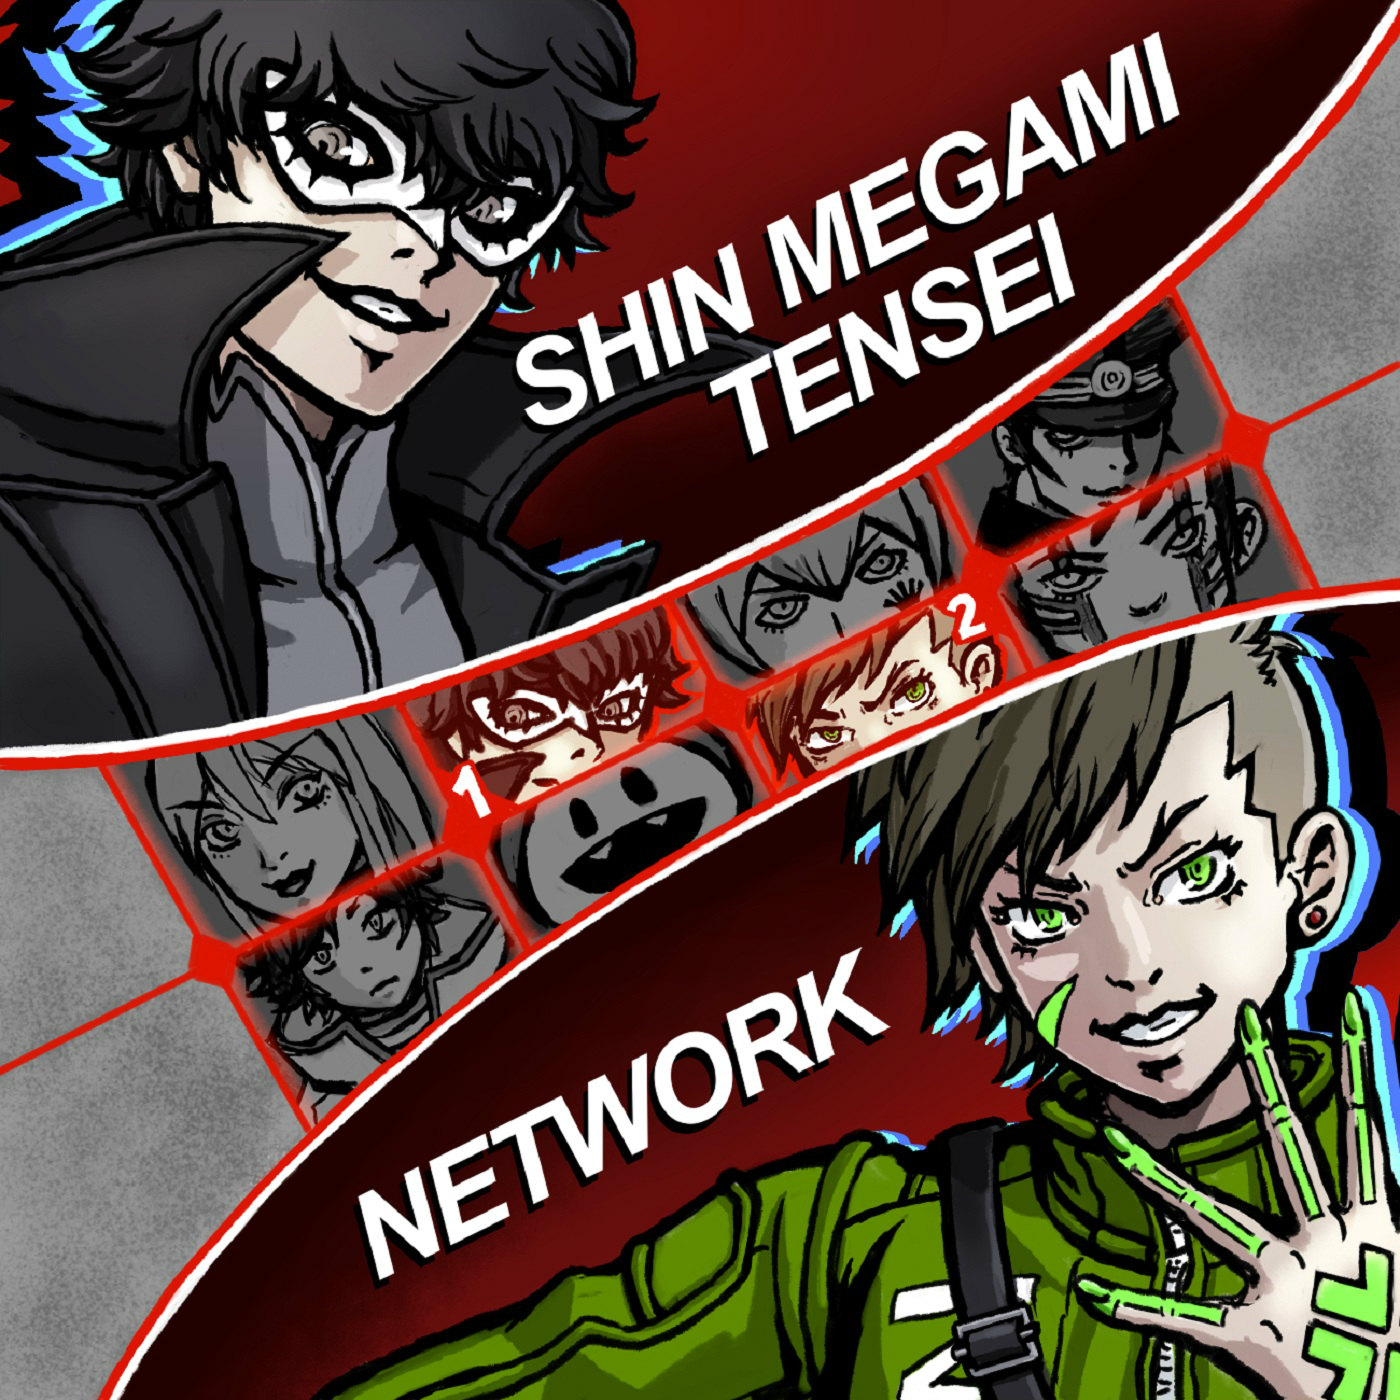 Shin Megami Tensei Network